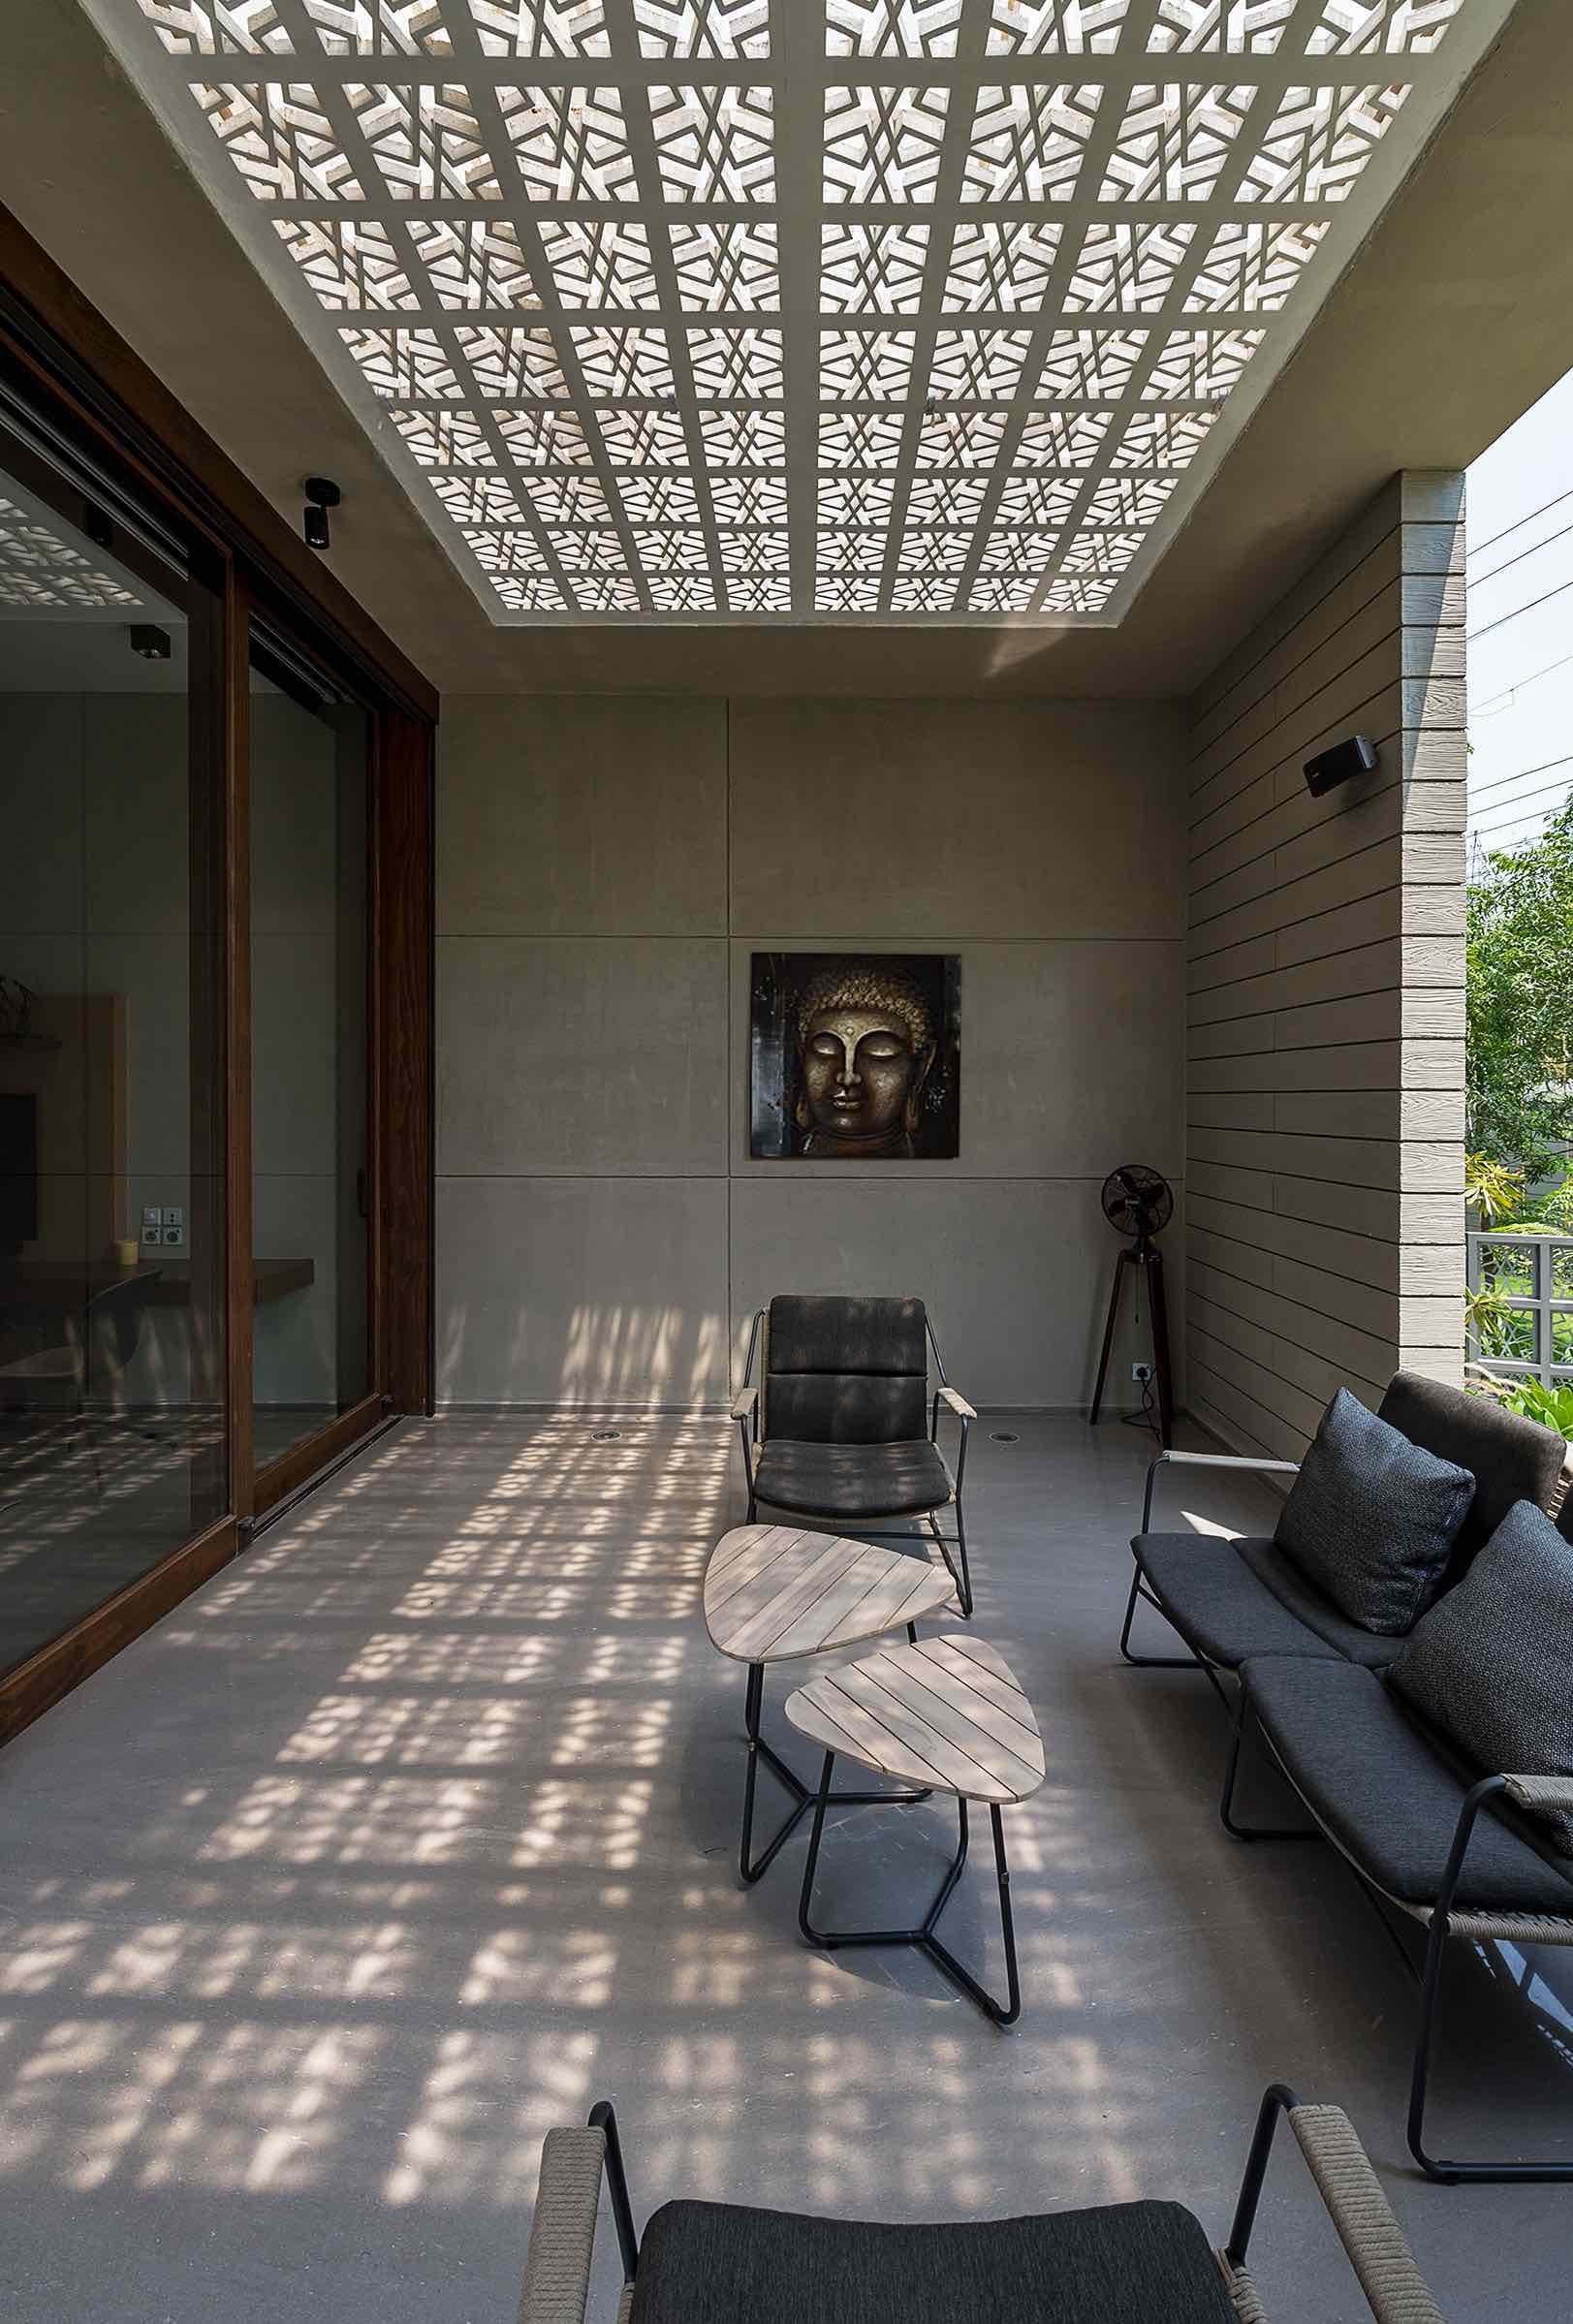 18_Screens_Sanjay_Puri_architects_india_amazingarchitecture_011.jpg